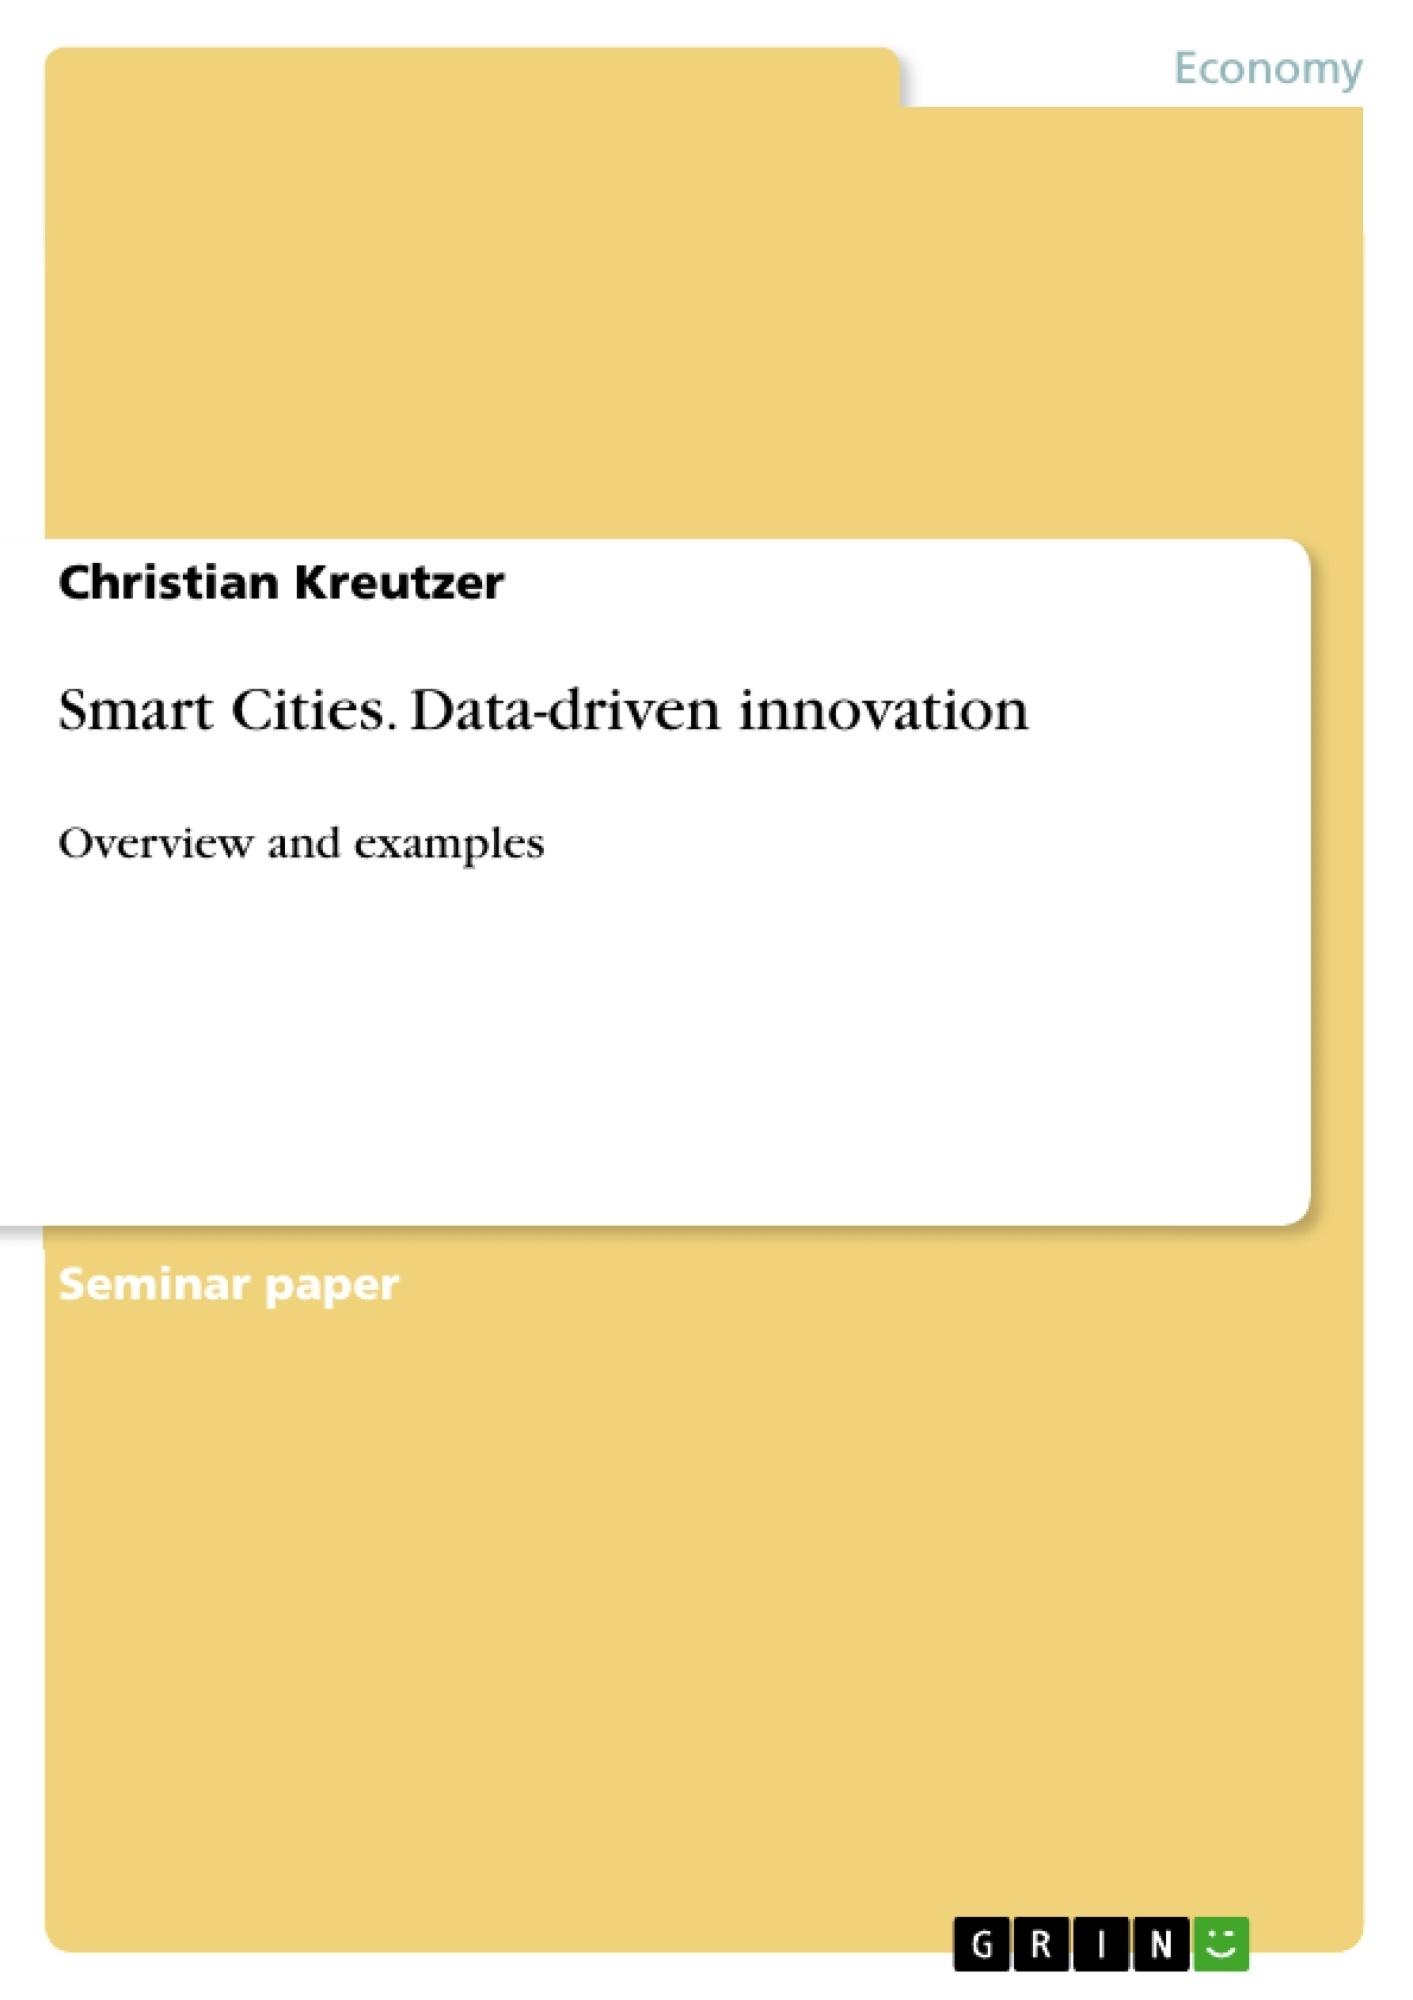 Title: Smart Cities. Data-driven innovation